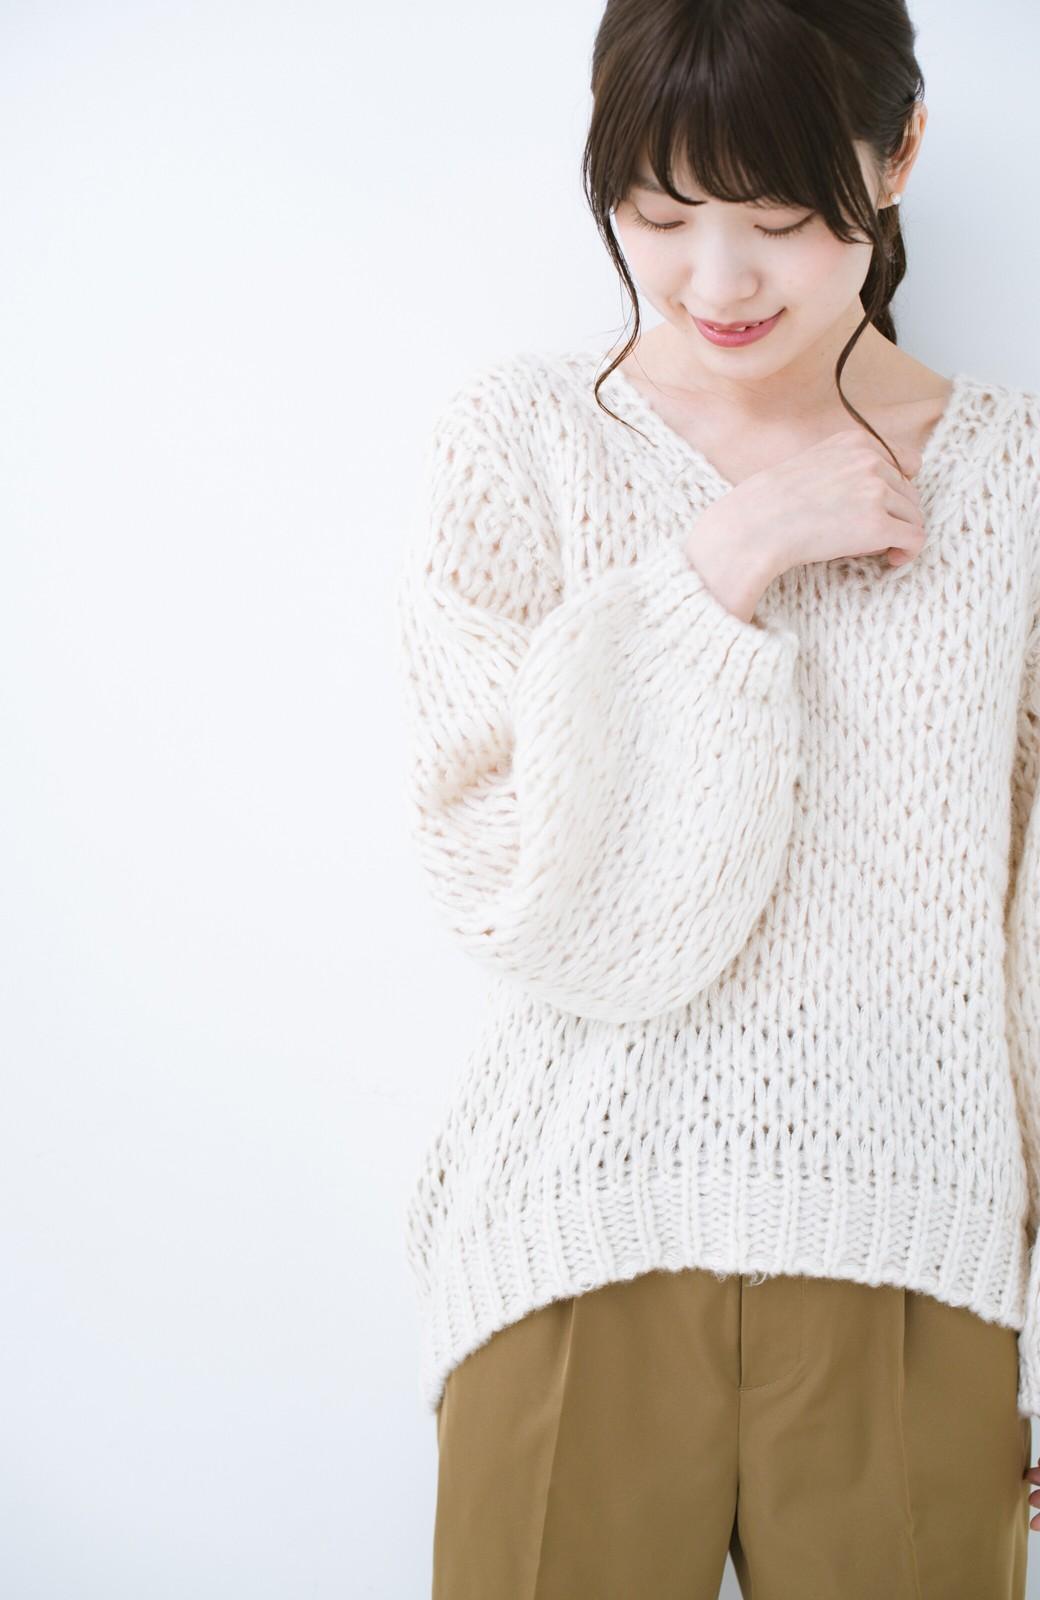 haco! 手編み風のざっくり感で女っぽい Vネックの甘編みルーズニット <アイボリー>の商品写真6